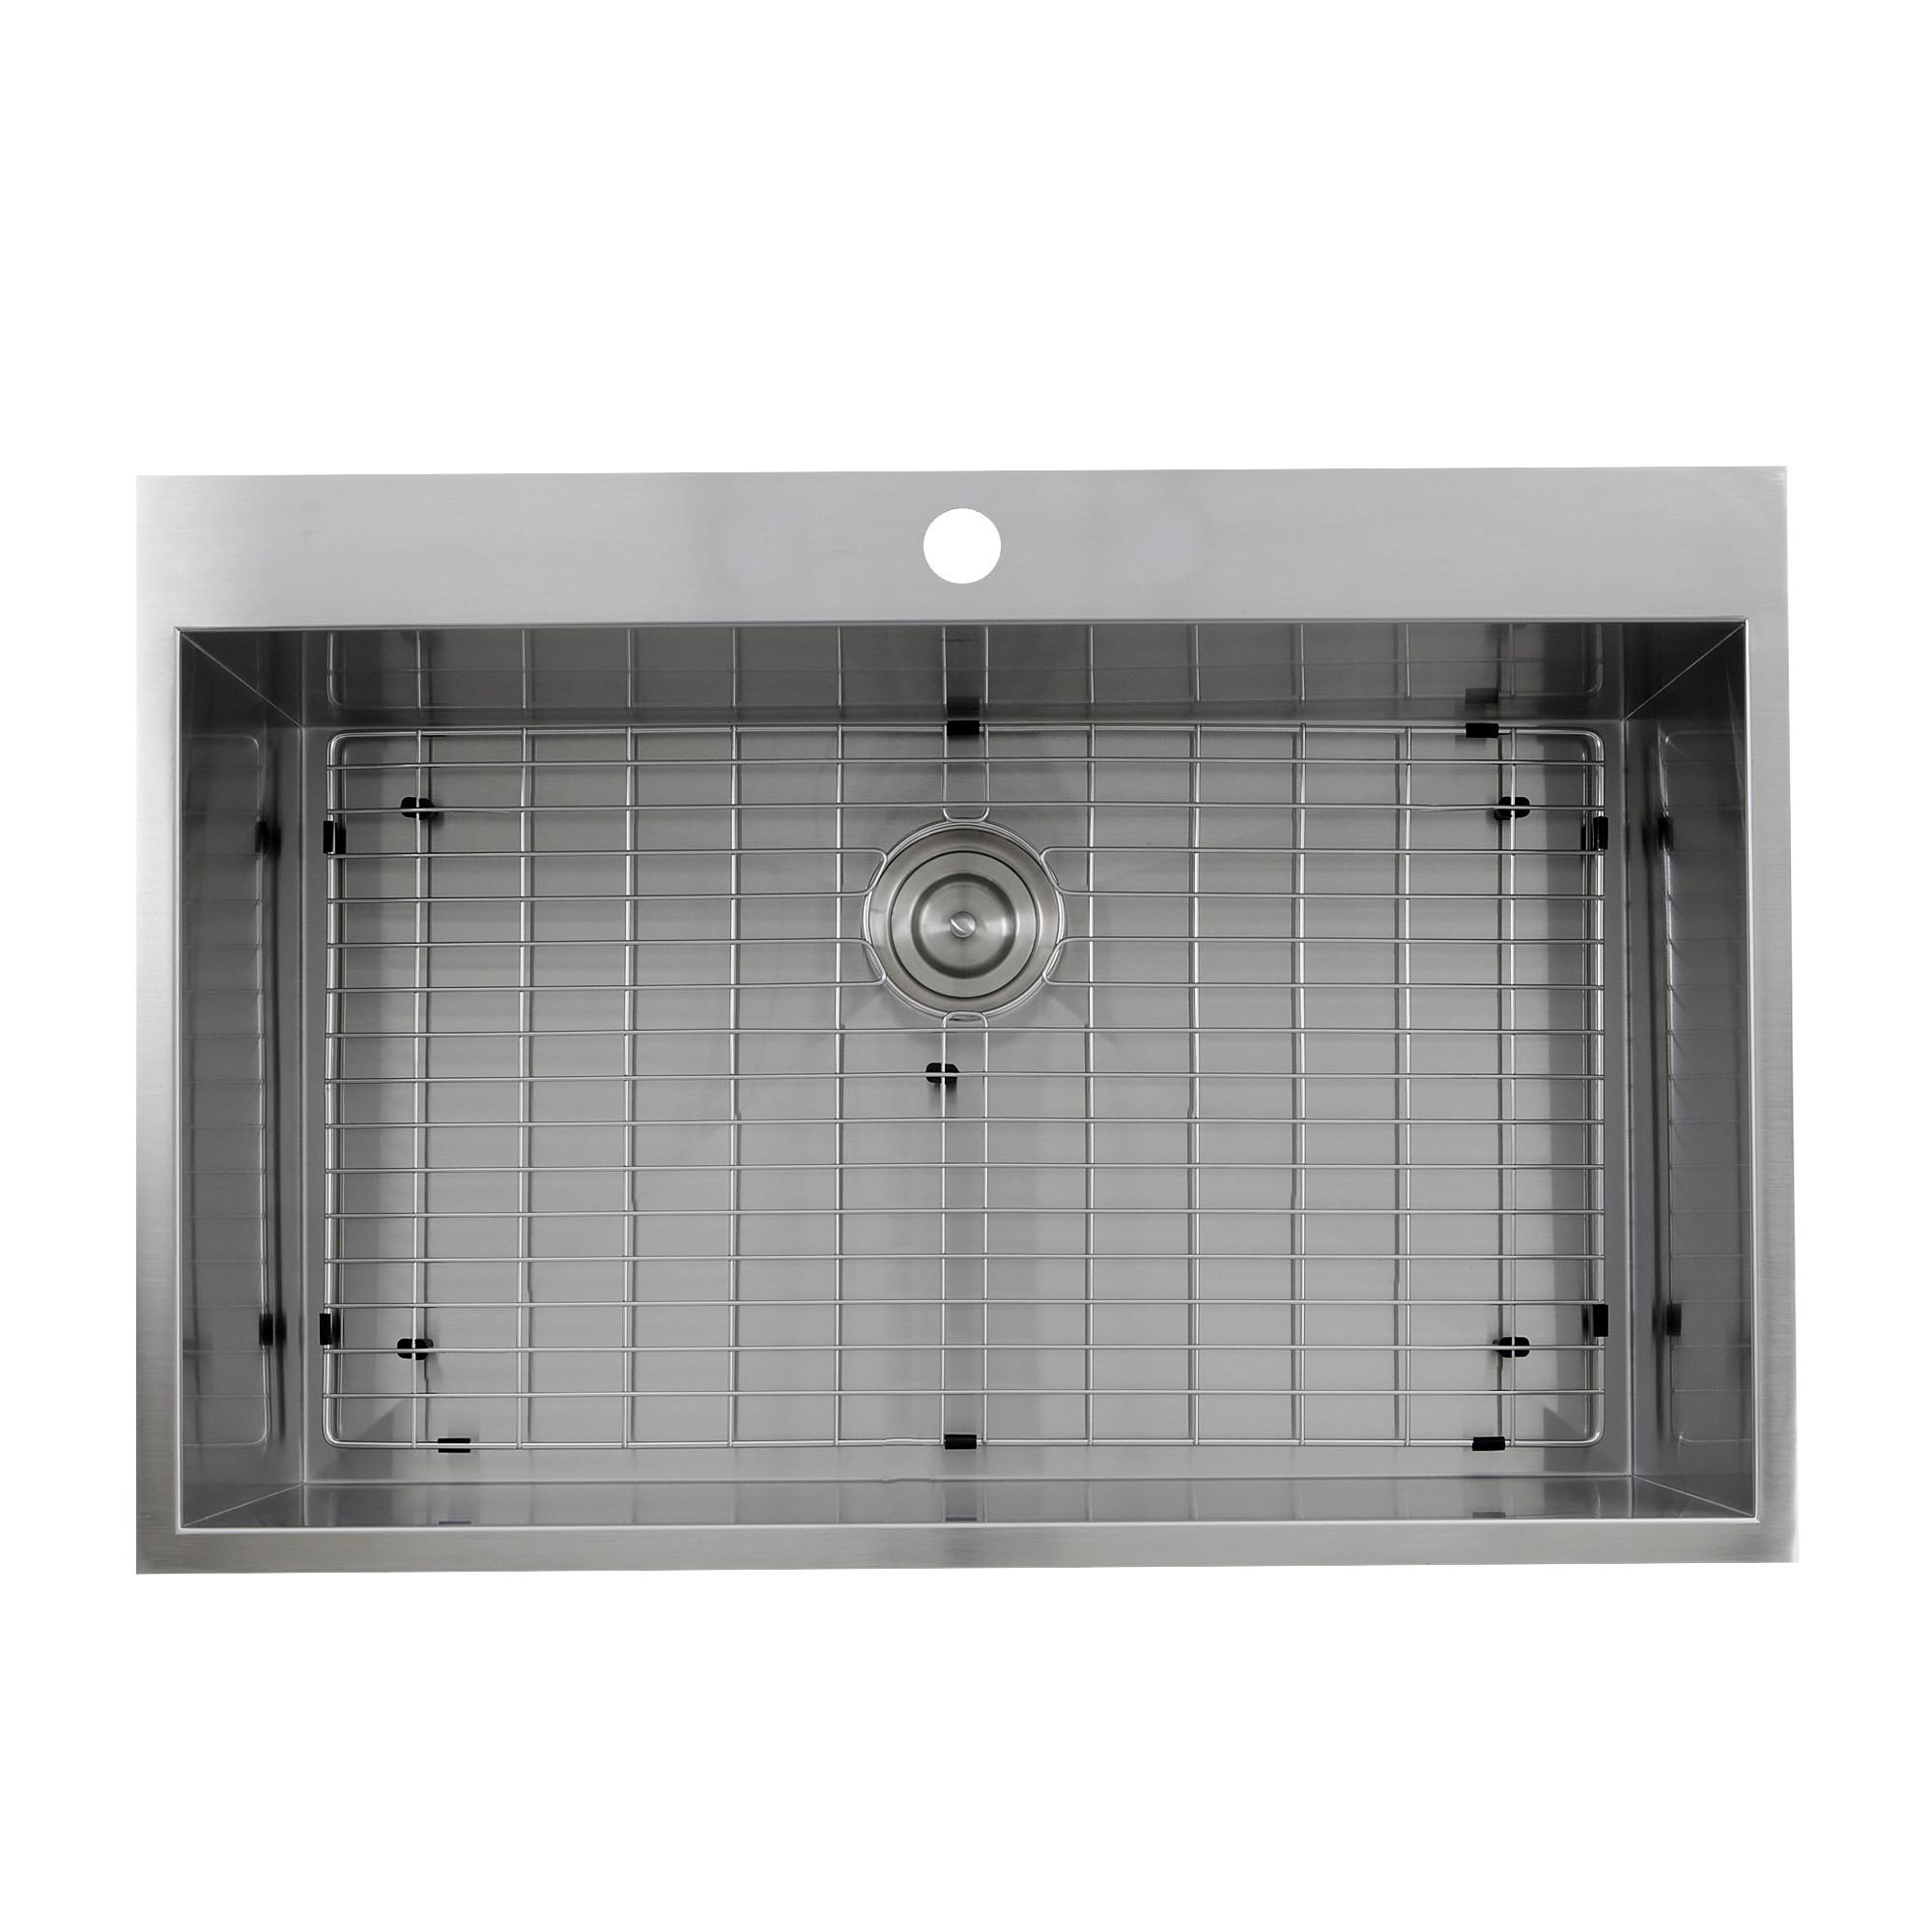 Nantucket Sinks ZR3322-S-16 Self Rimming Stainless Steel Kitchen Sink